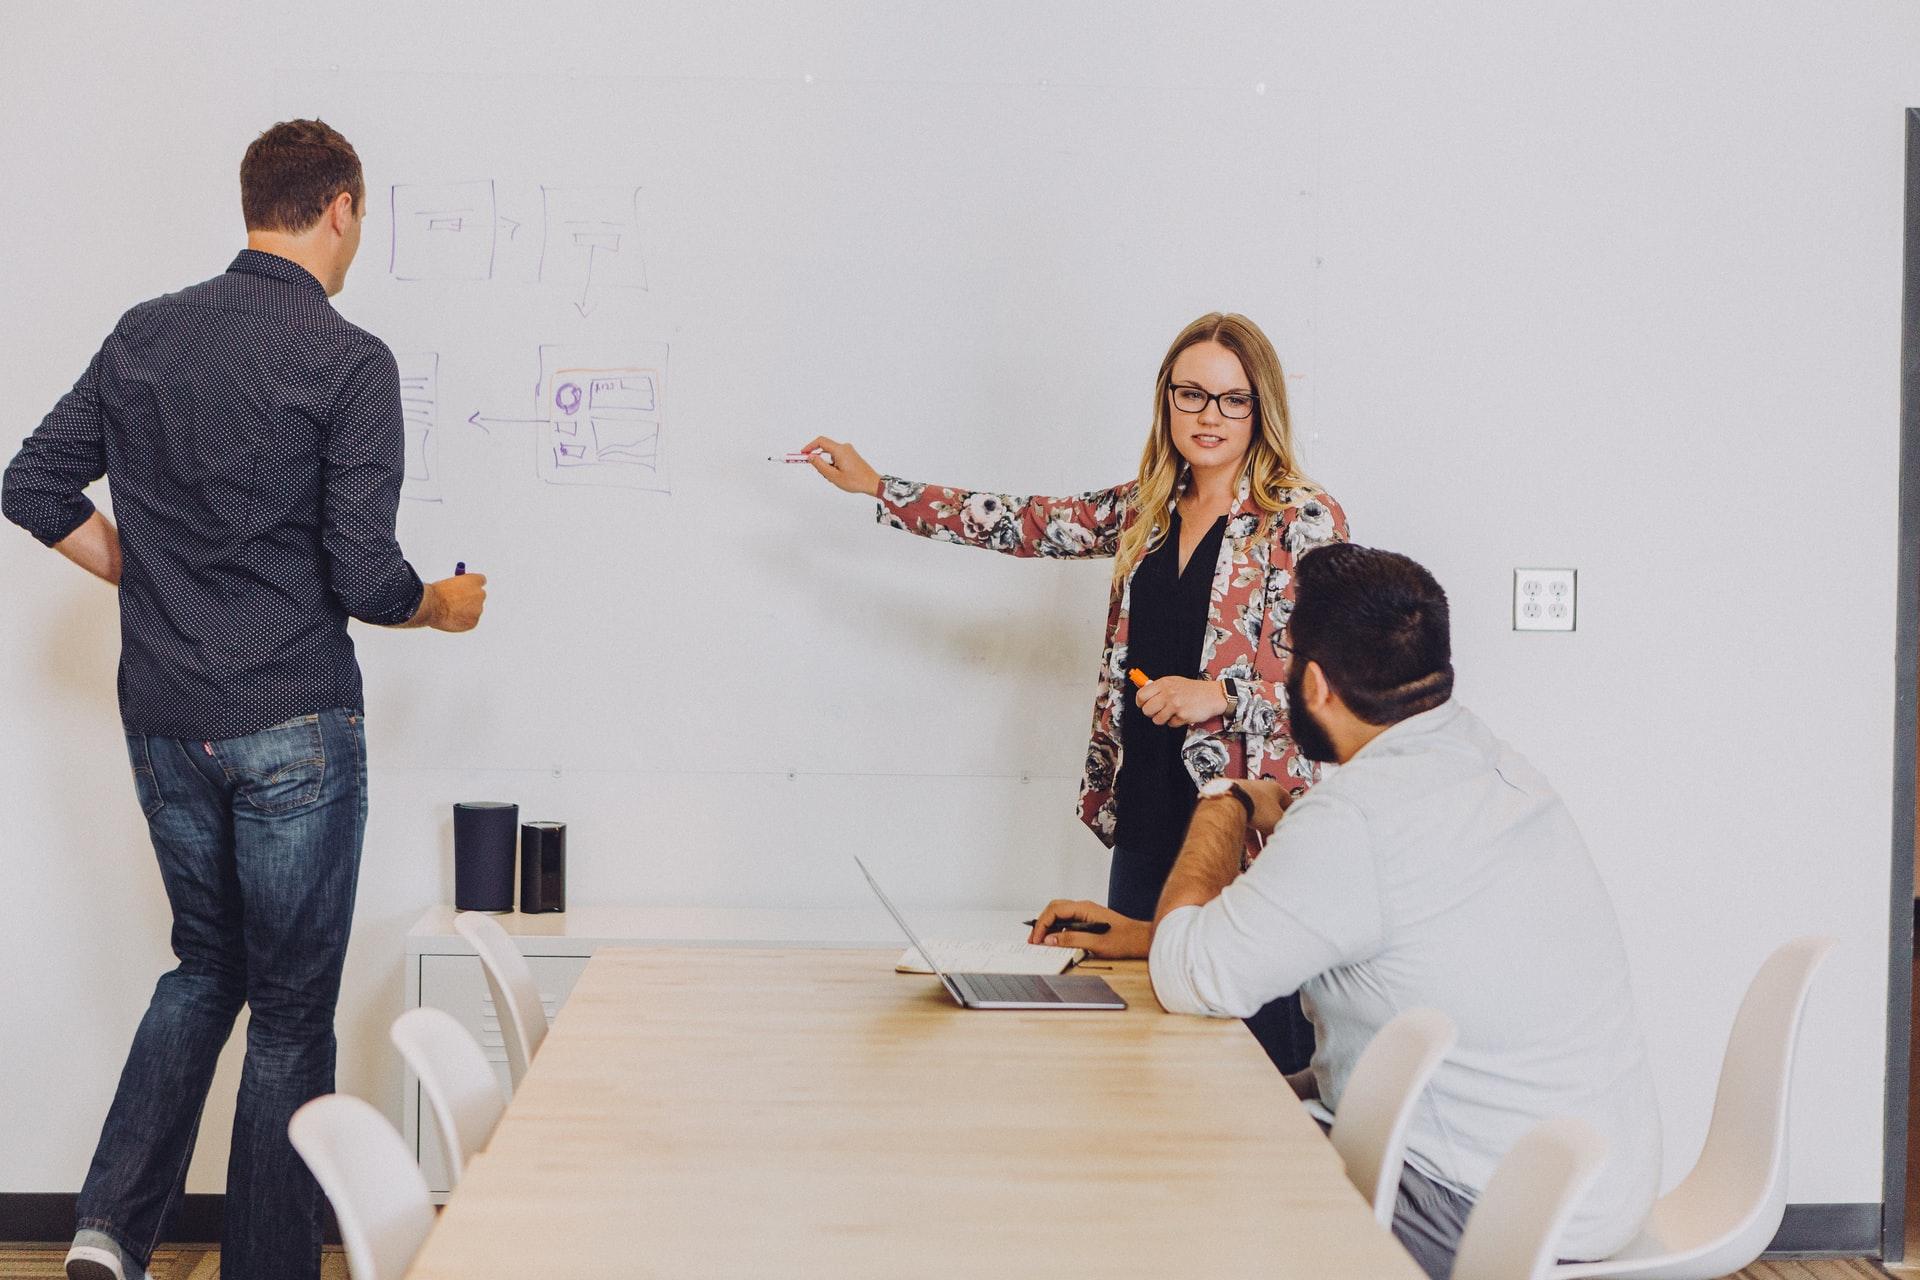 Build Effective Marketing Strategies